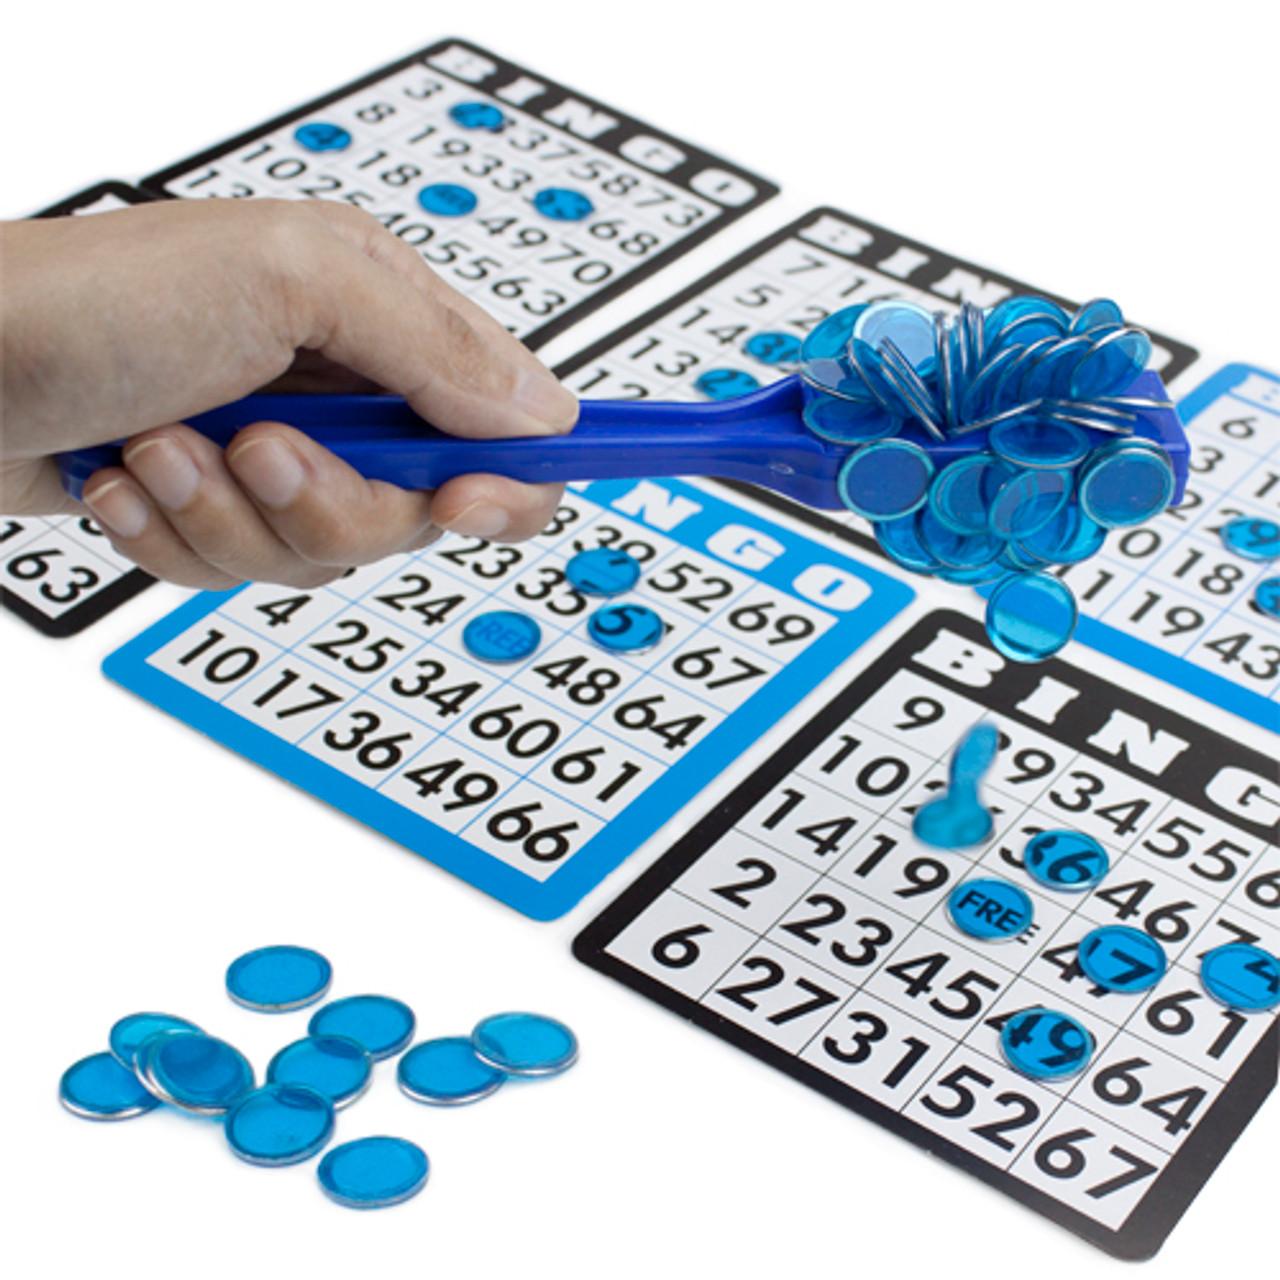 Purple Bingo Chips